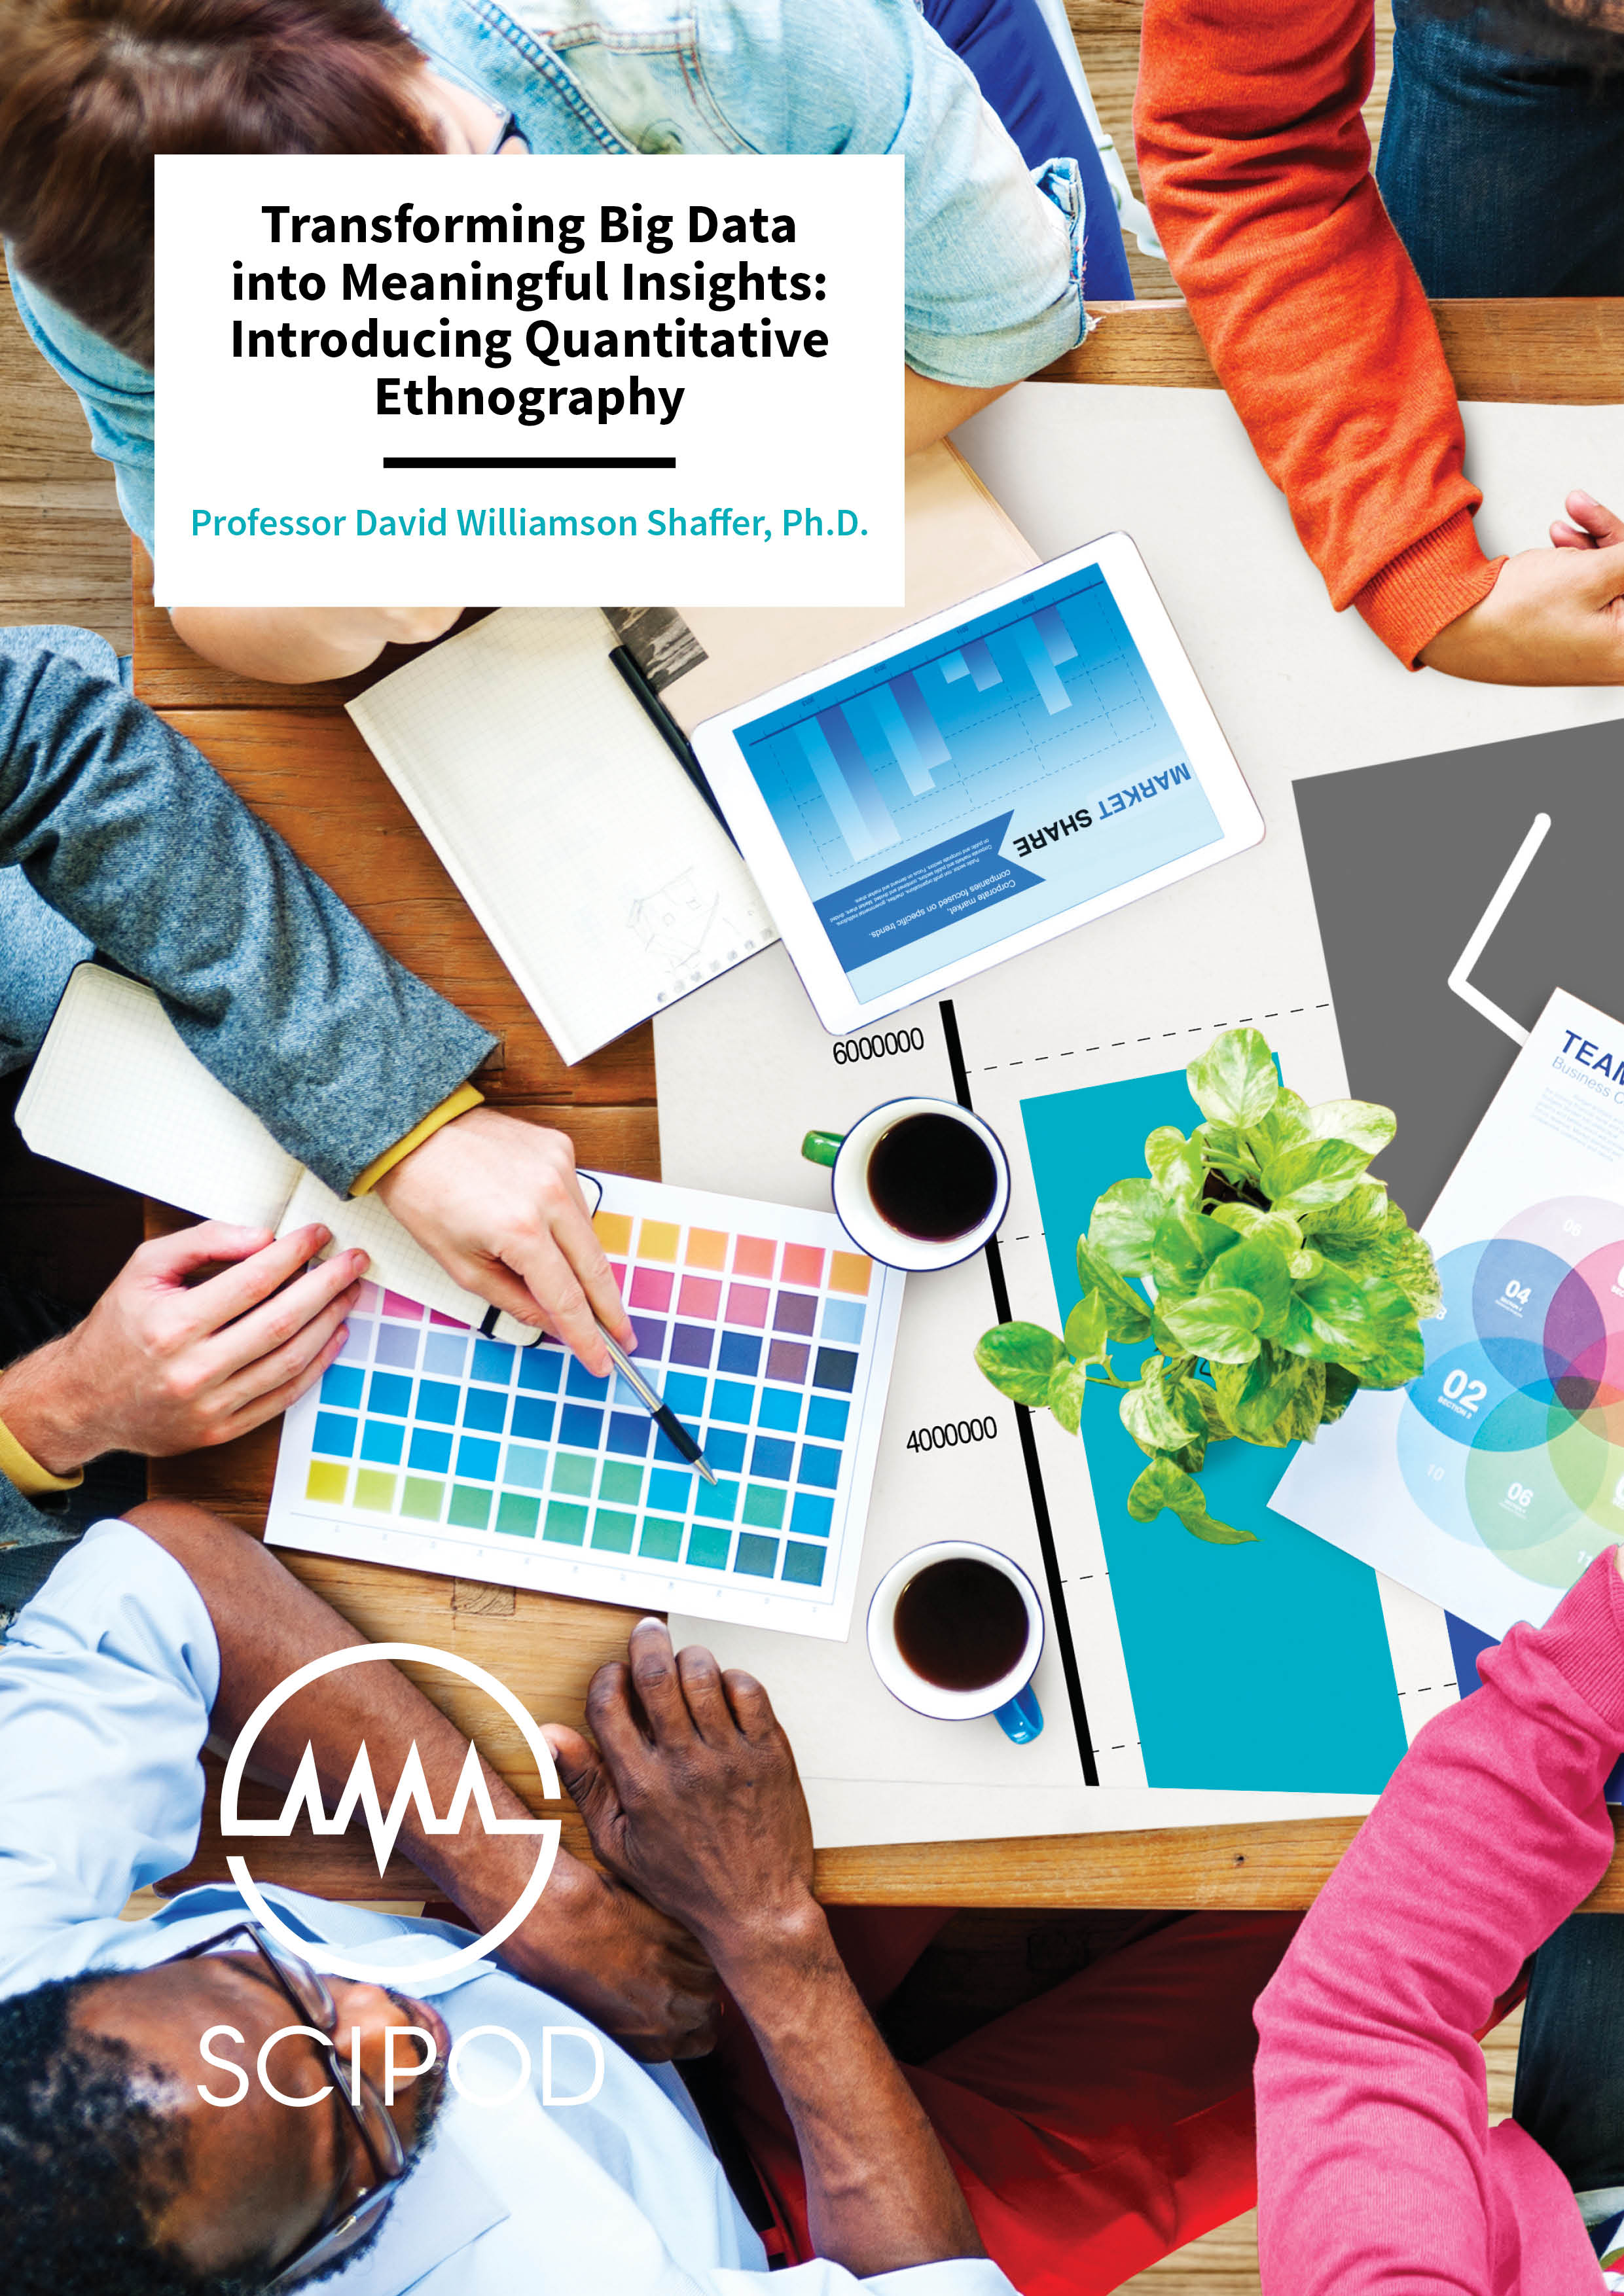 Transforming Big Data into Meaningful Insights Introducing Quantitative Ethnography – Professor David Williamson Shaffer, University of Wisconsin-Madison